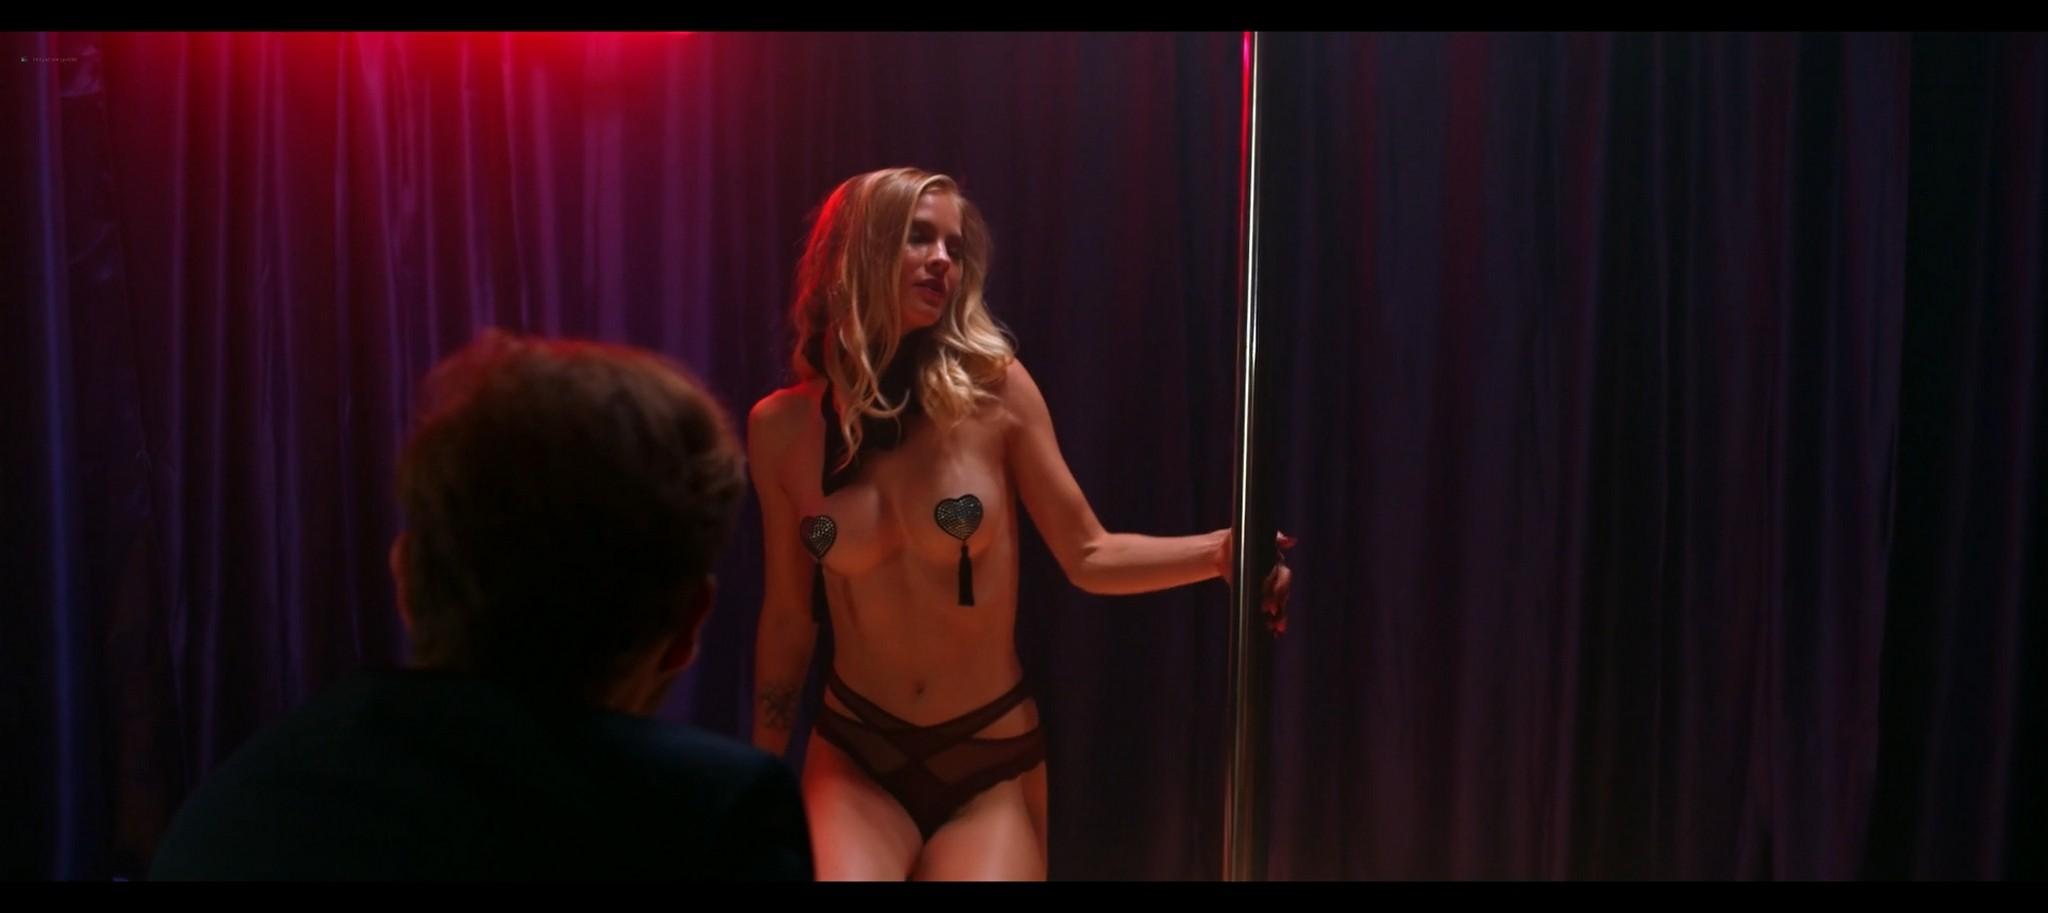 Kenzie Dalton hot Drue Knapp Ava Locklear sexy A Dark Foe 2021 1080p Web 14